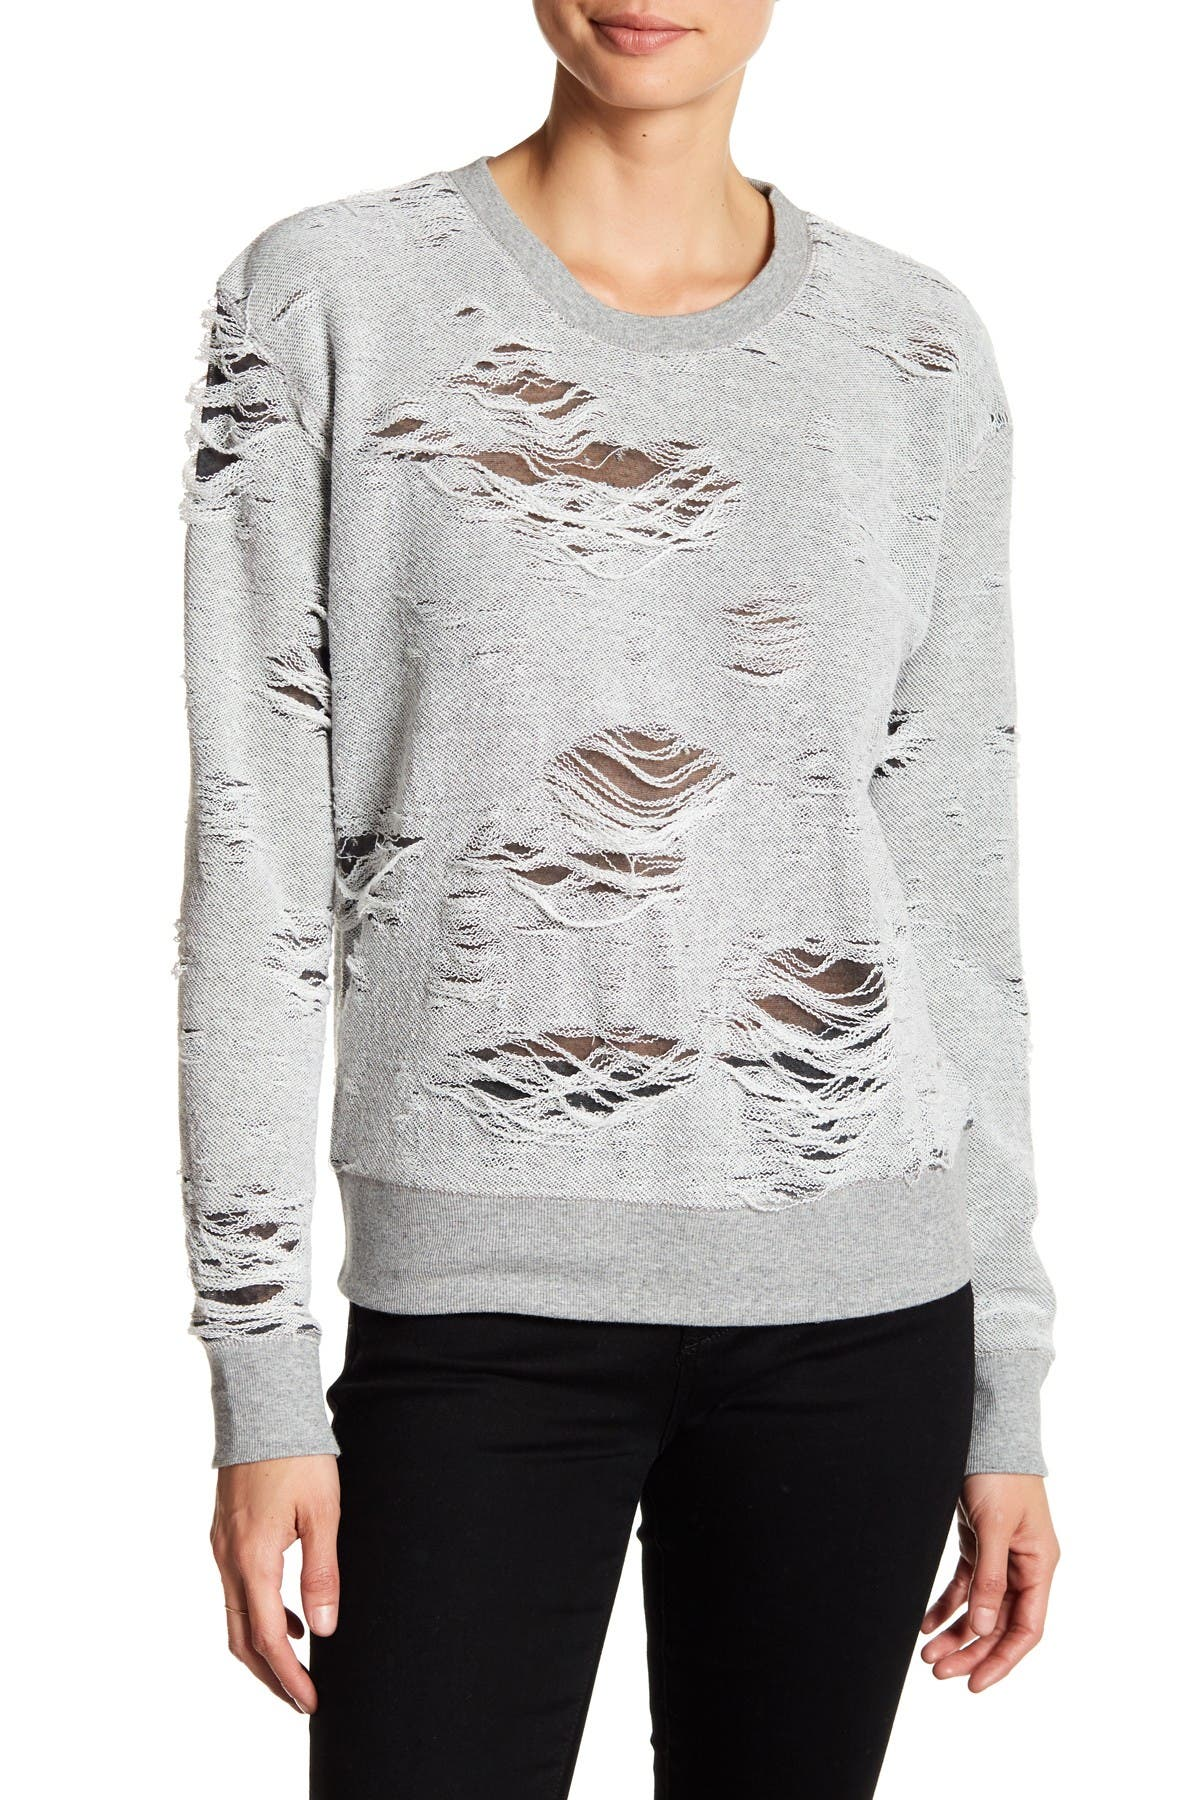 Image of Sweet Romeo Distressed Looped Knit Sweatshirt